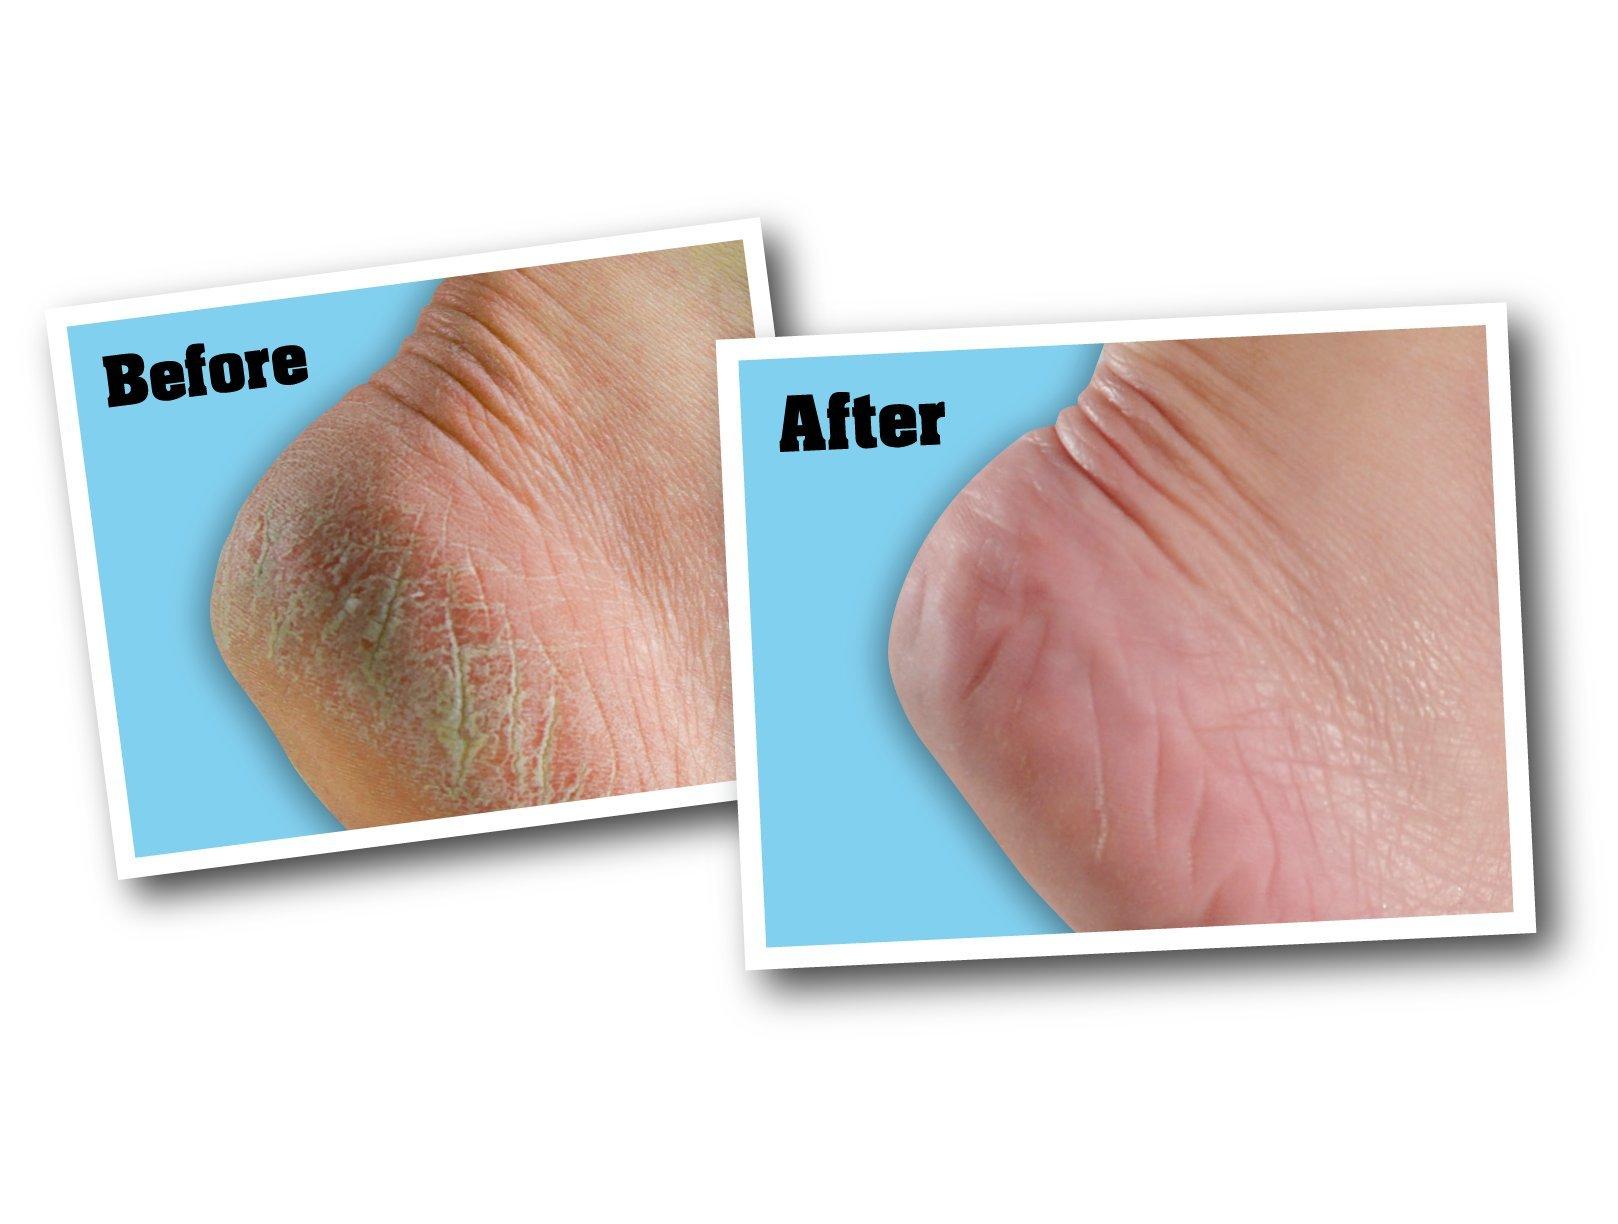 O'Keeffe's K0280016 K0280004-2 Healthy Feet Foot Cream Tube (2 Pack), 3 oz by O'Keeffe's (Image #3)